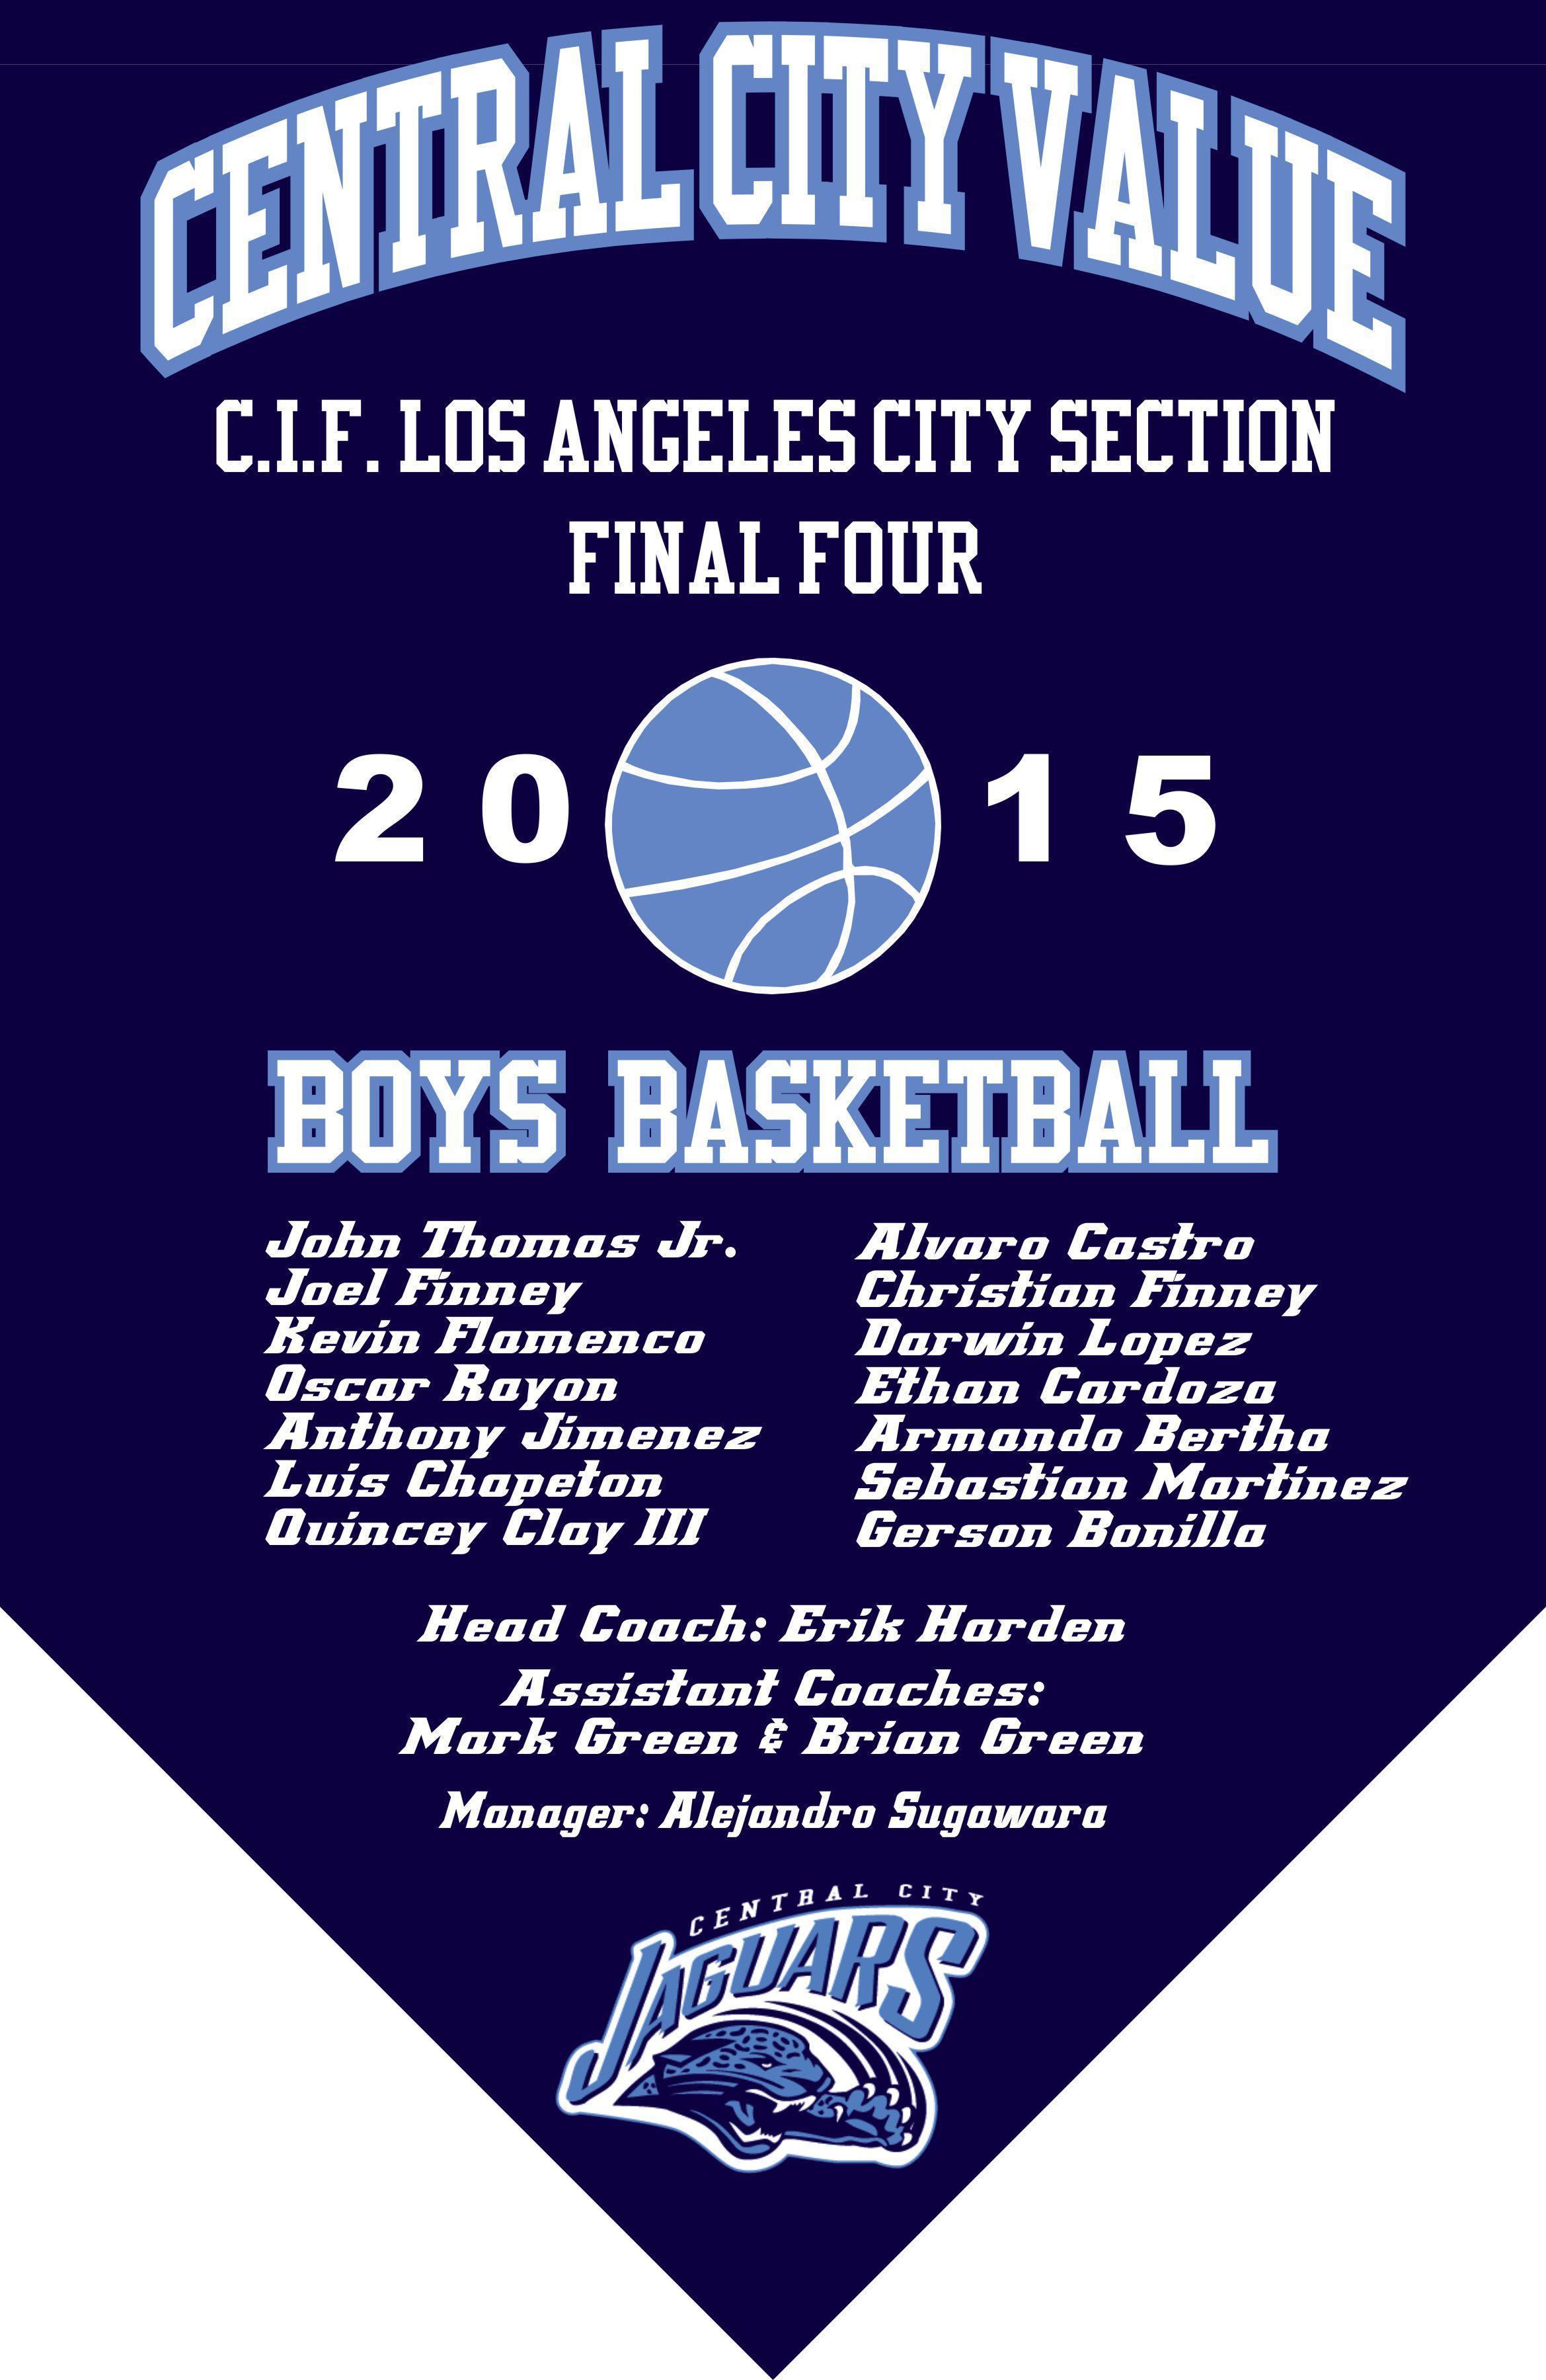 2015 Boys Basketball Final Four Banner